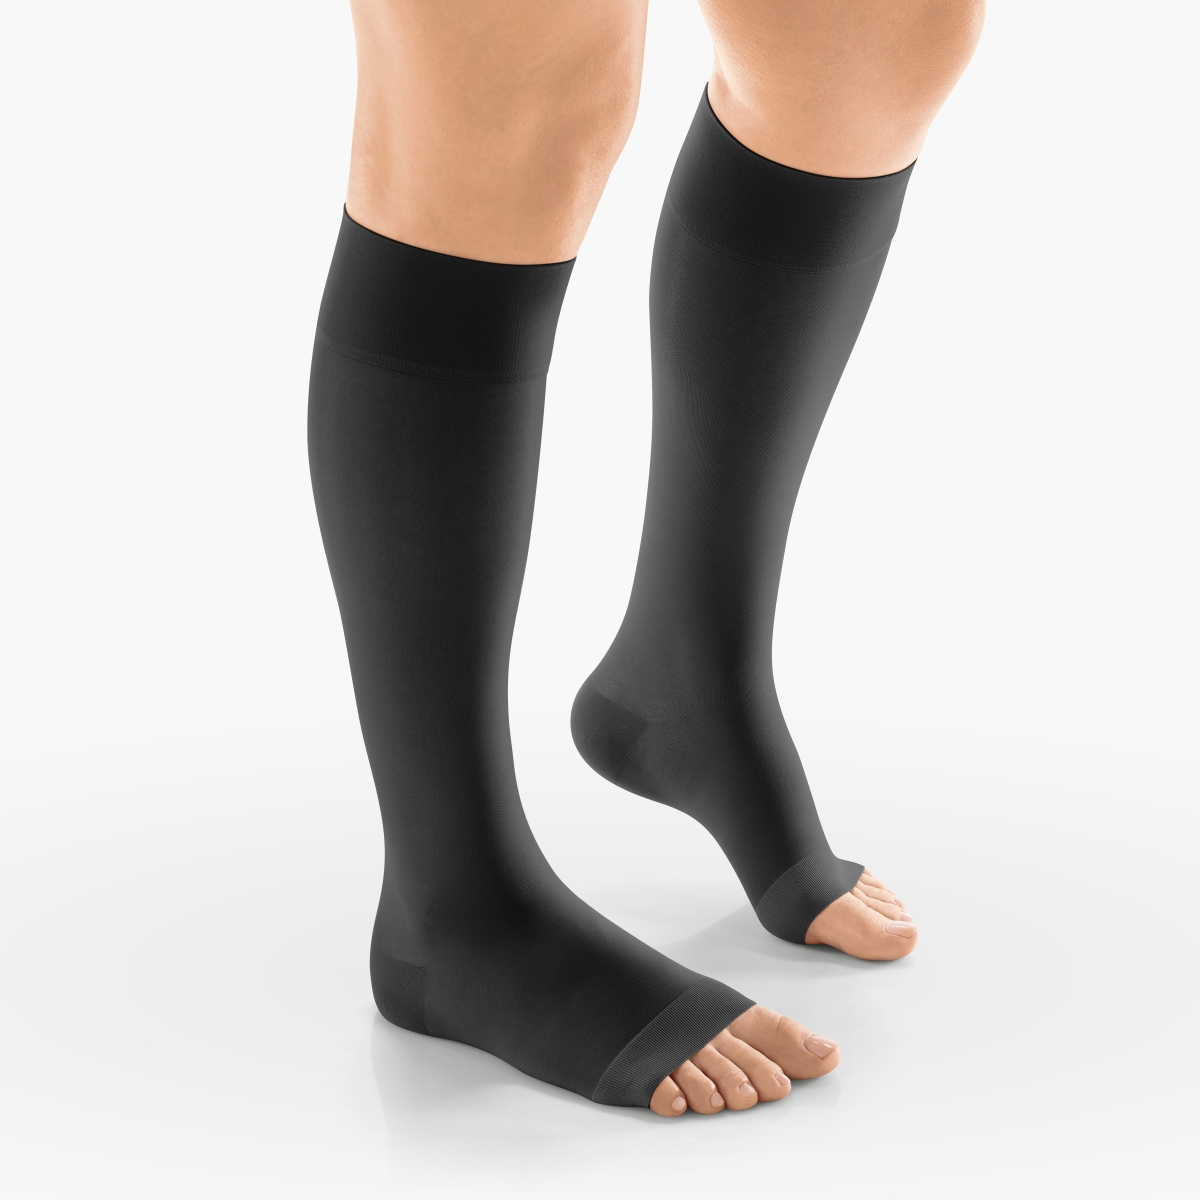 VENOSAN Sheer Secrets, Below Knee 15-20, Classic black, S, Open Toe Moderate 15-20 mmHg | Classic black | S |  | Open Toe | Knit Top